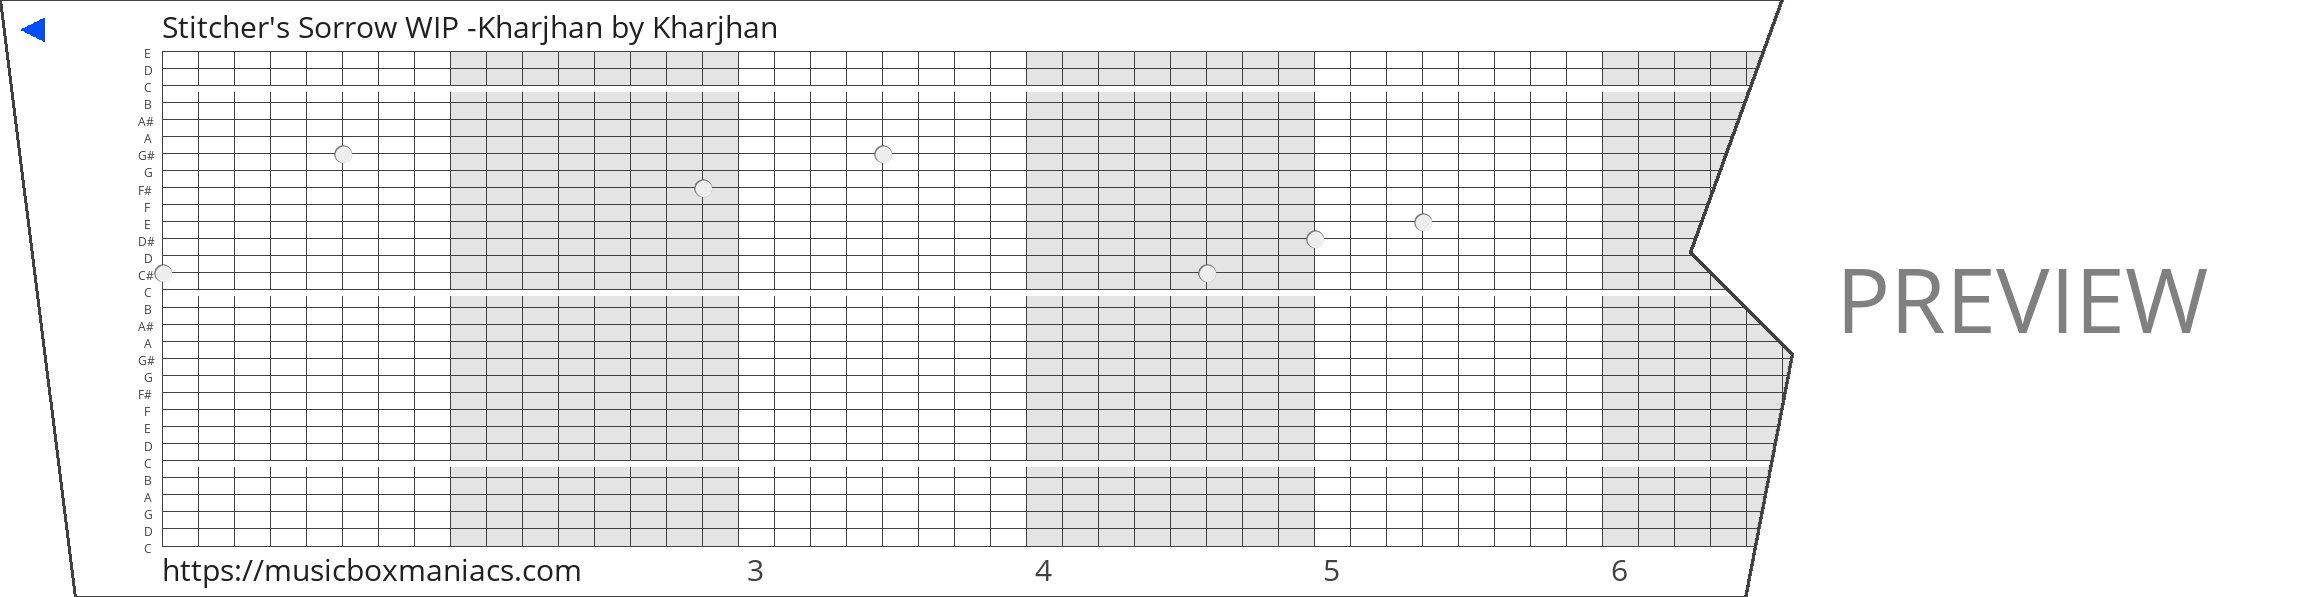 Stitcher's Sorrow WIP -Kharjhan 30 note music box paper strip